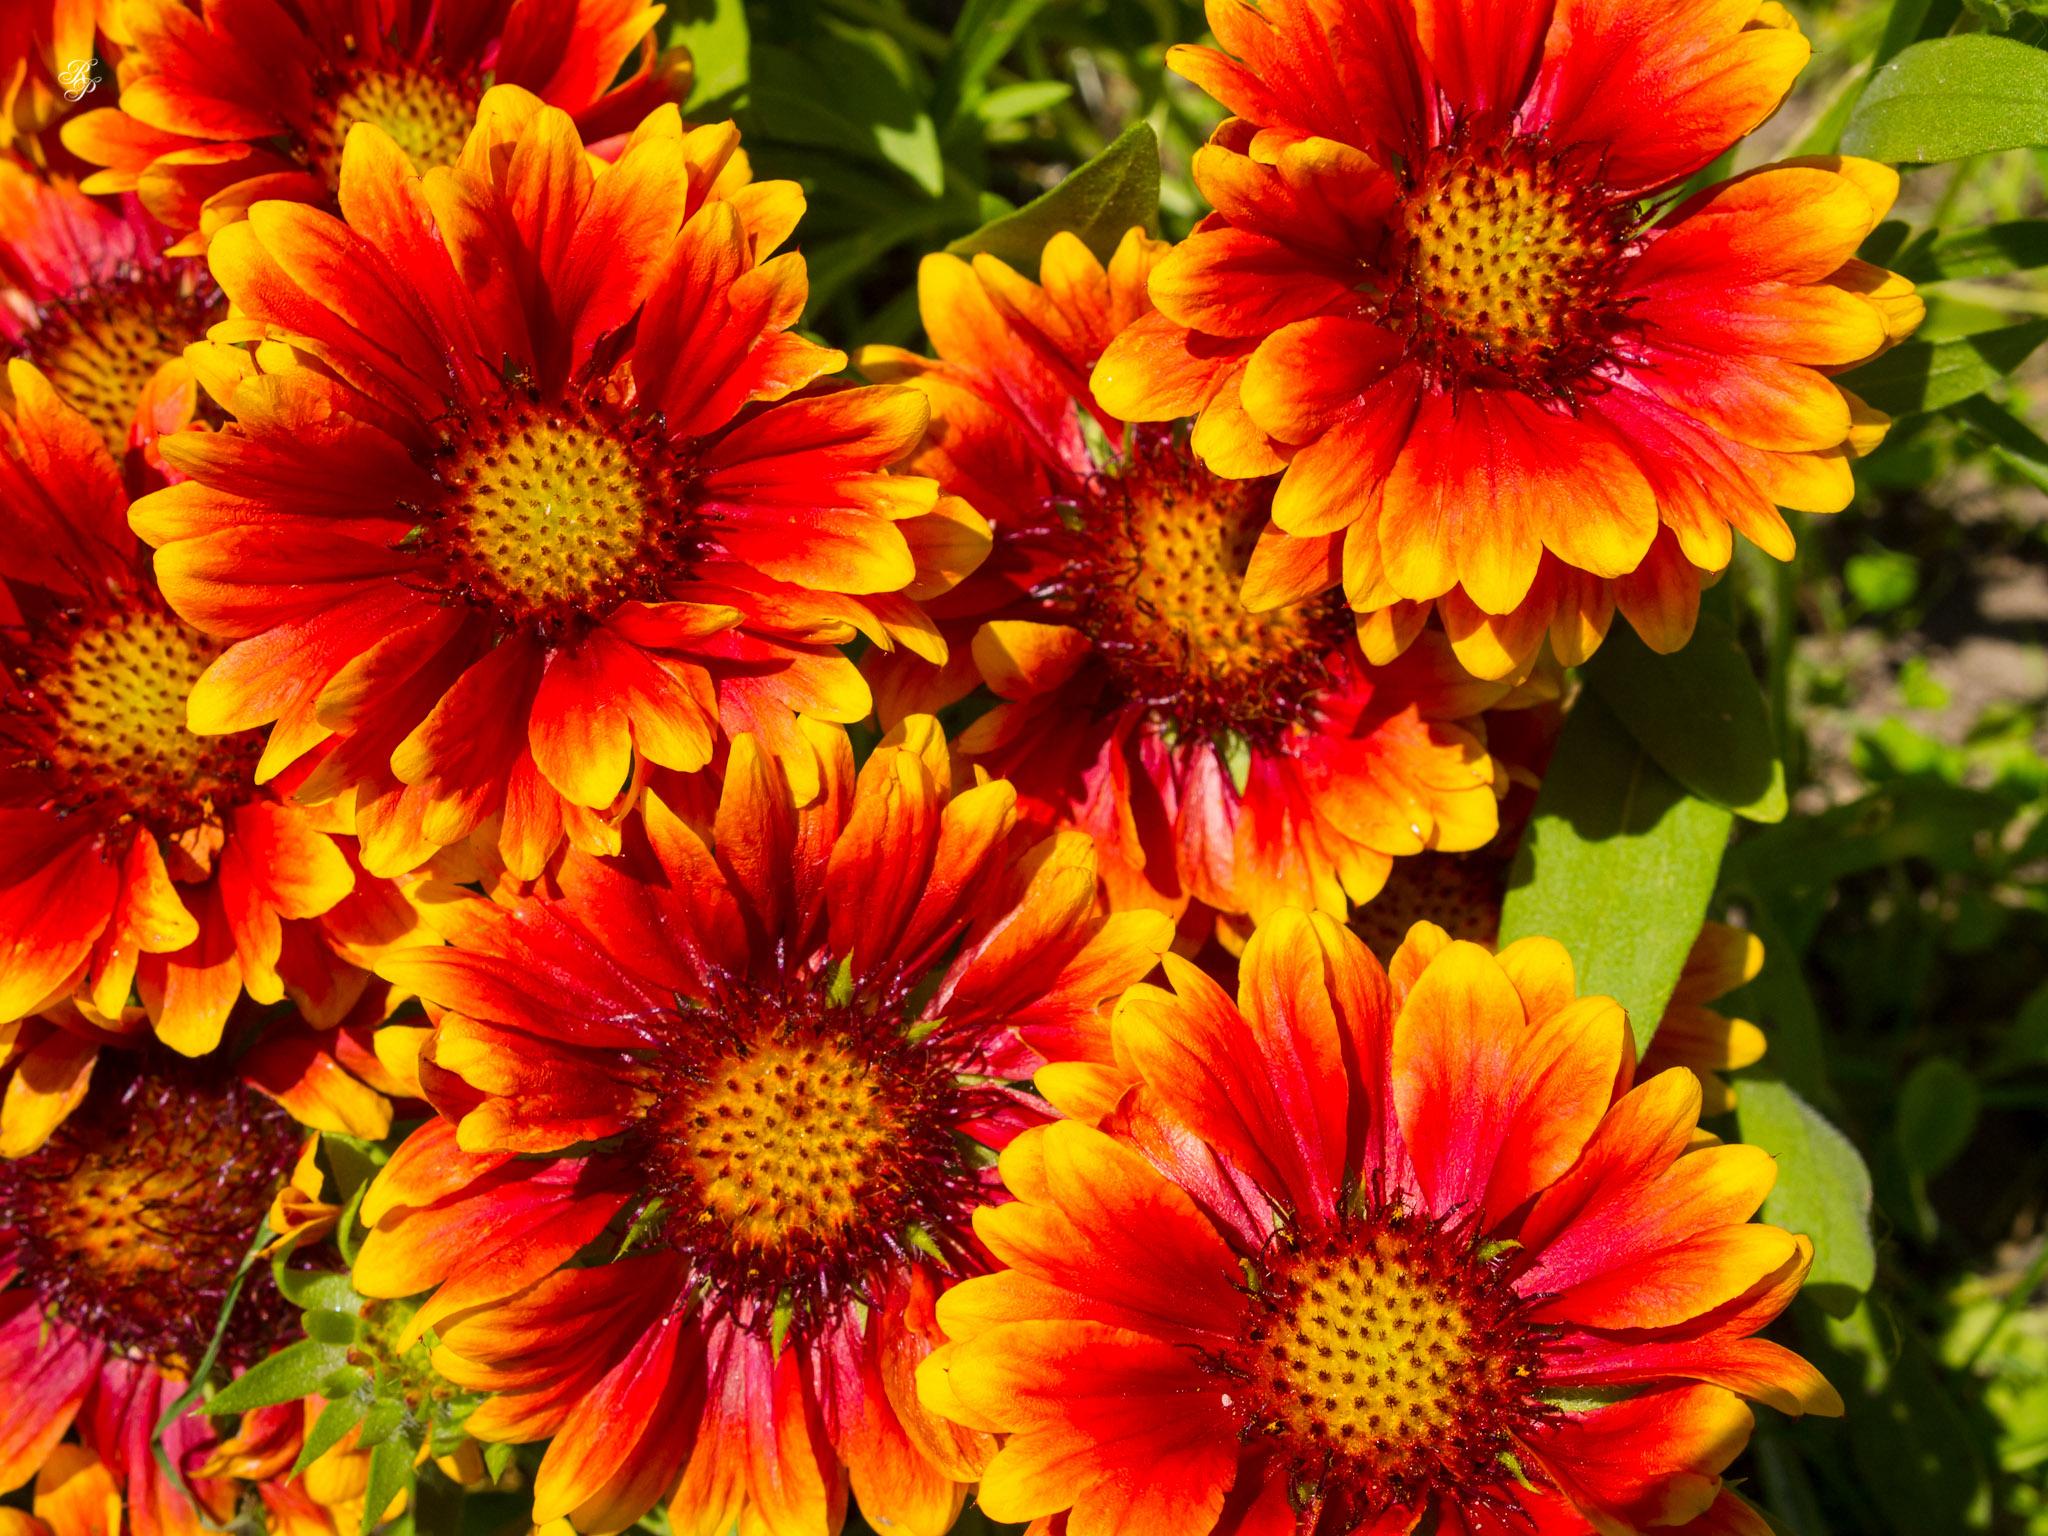 Orange-red flowers - Raoul Pop